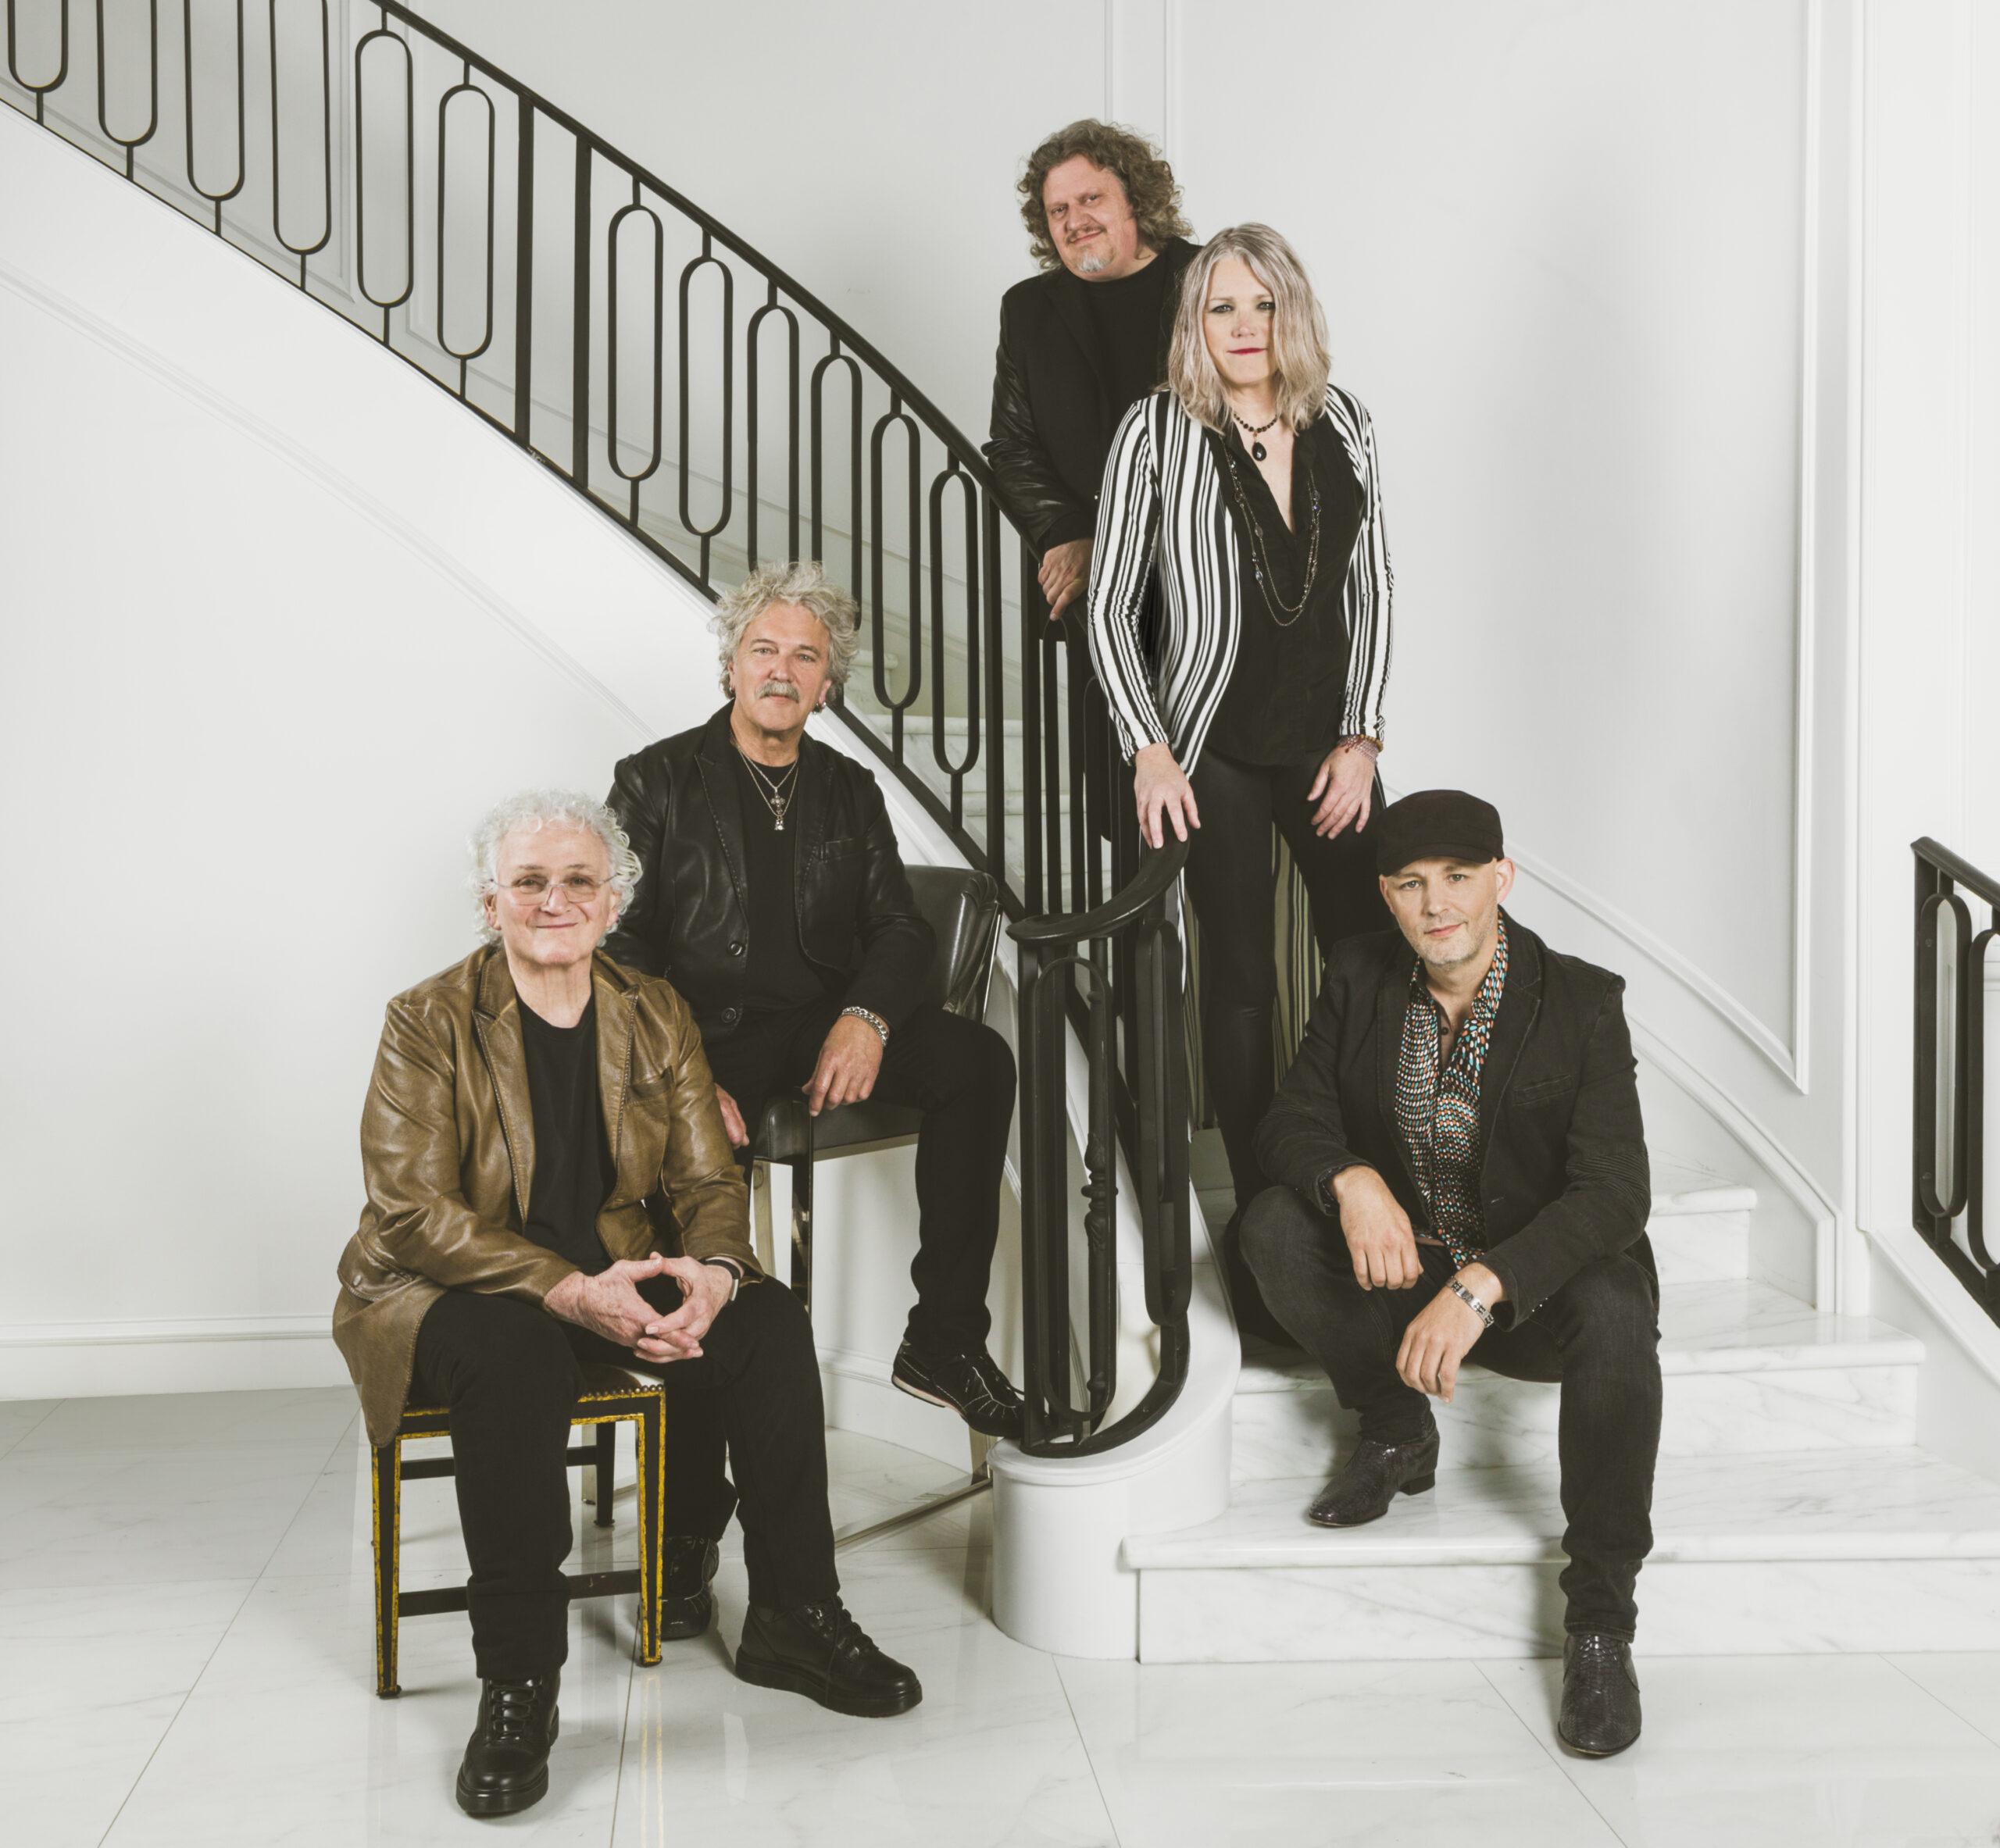 Jefferson Starship – Mother of the Sun Tour